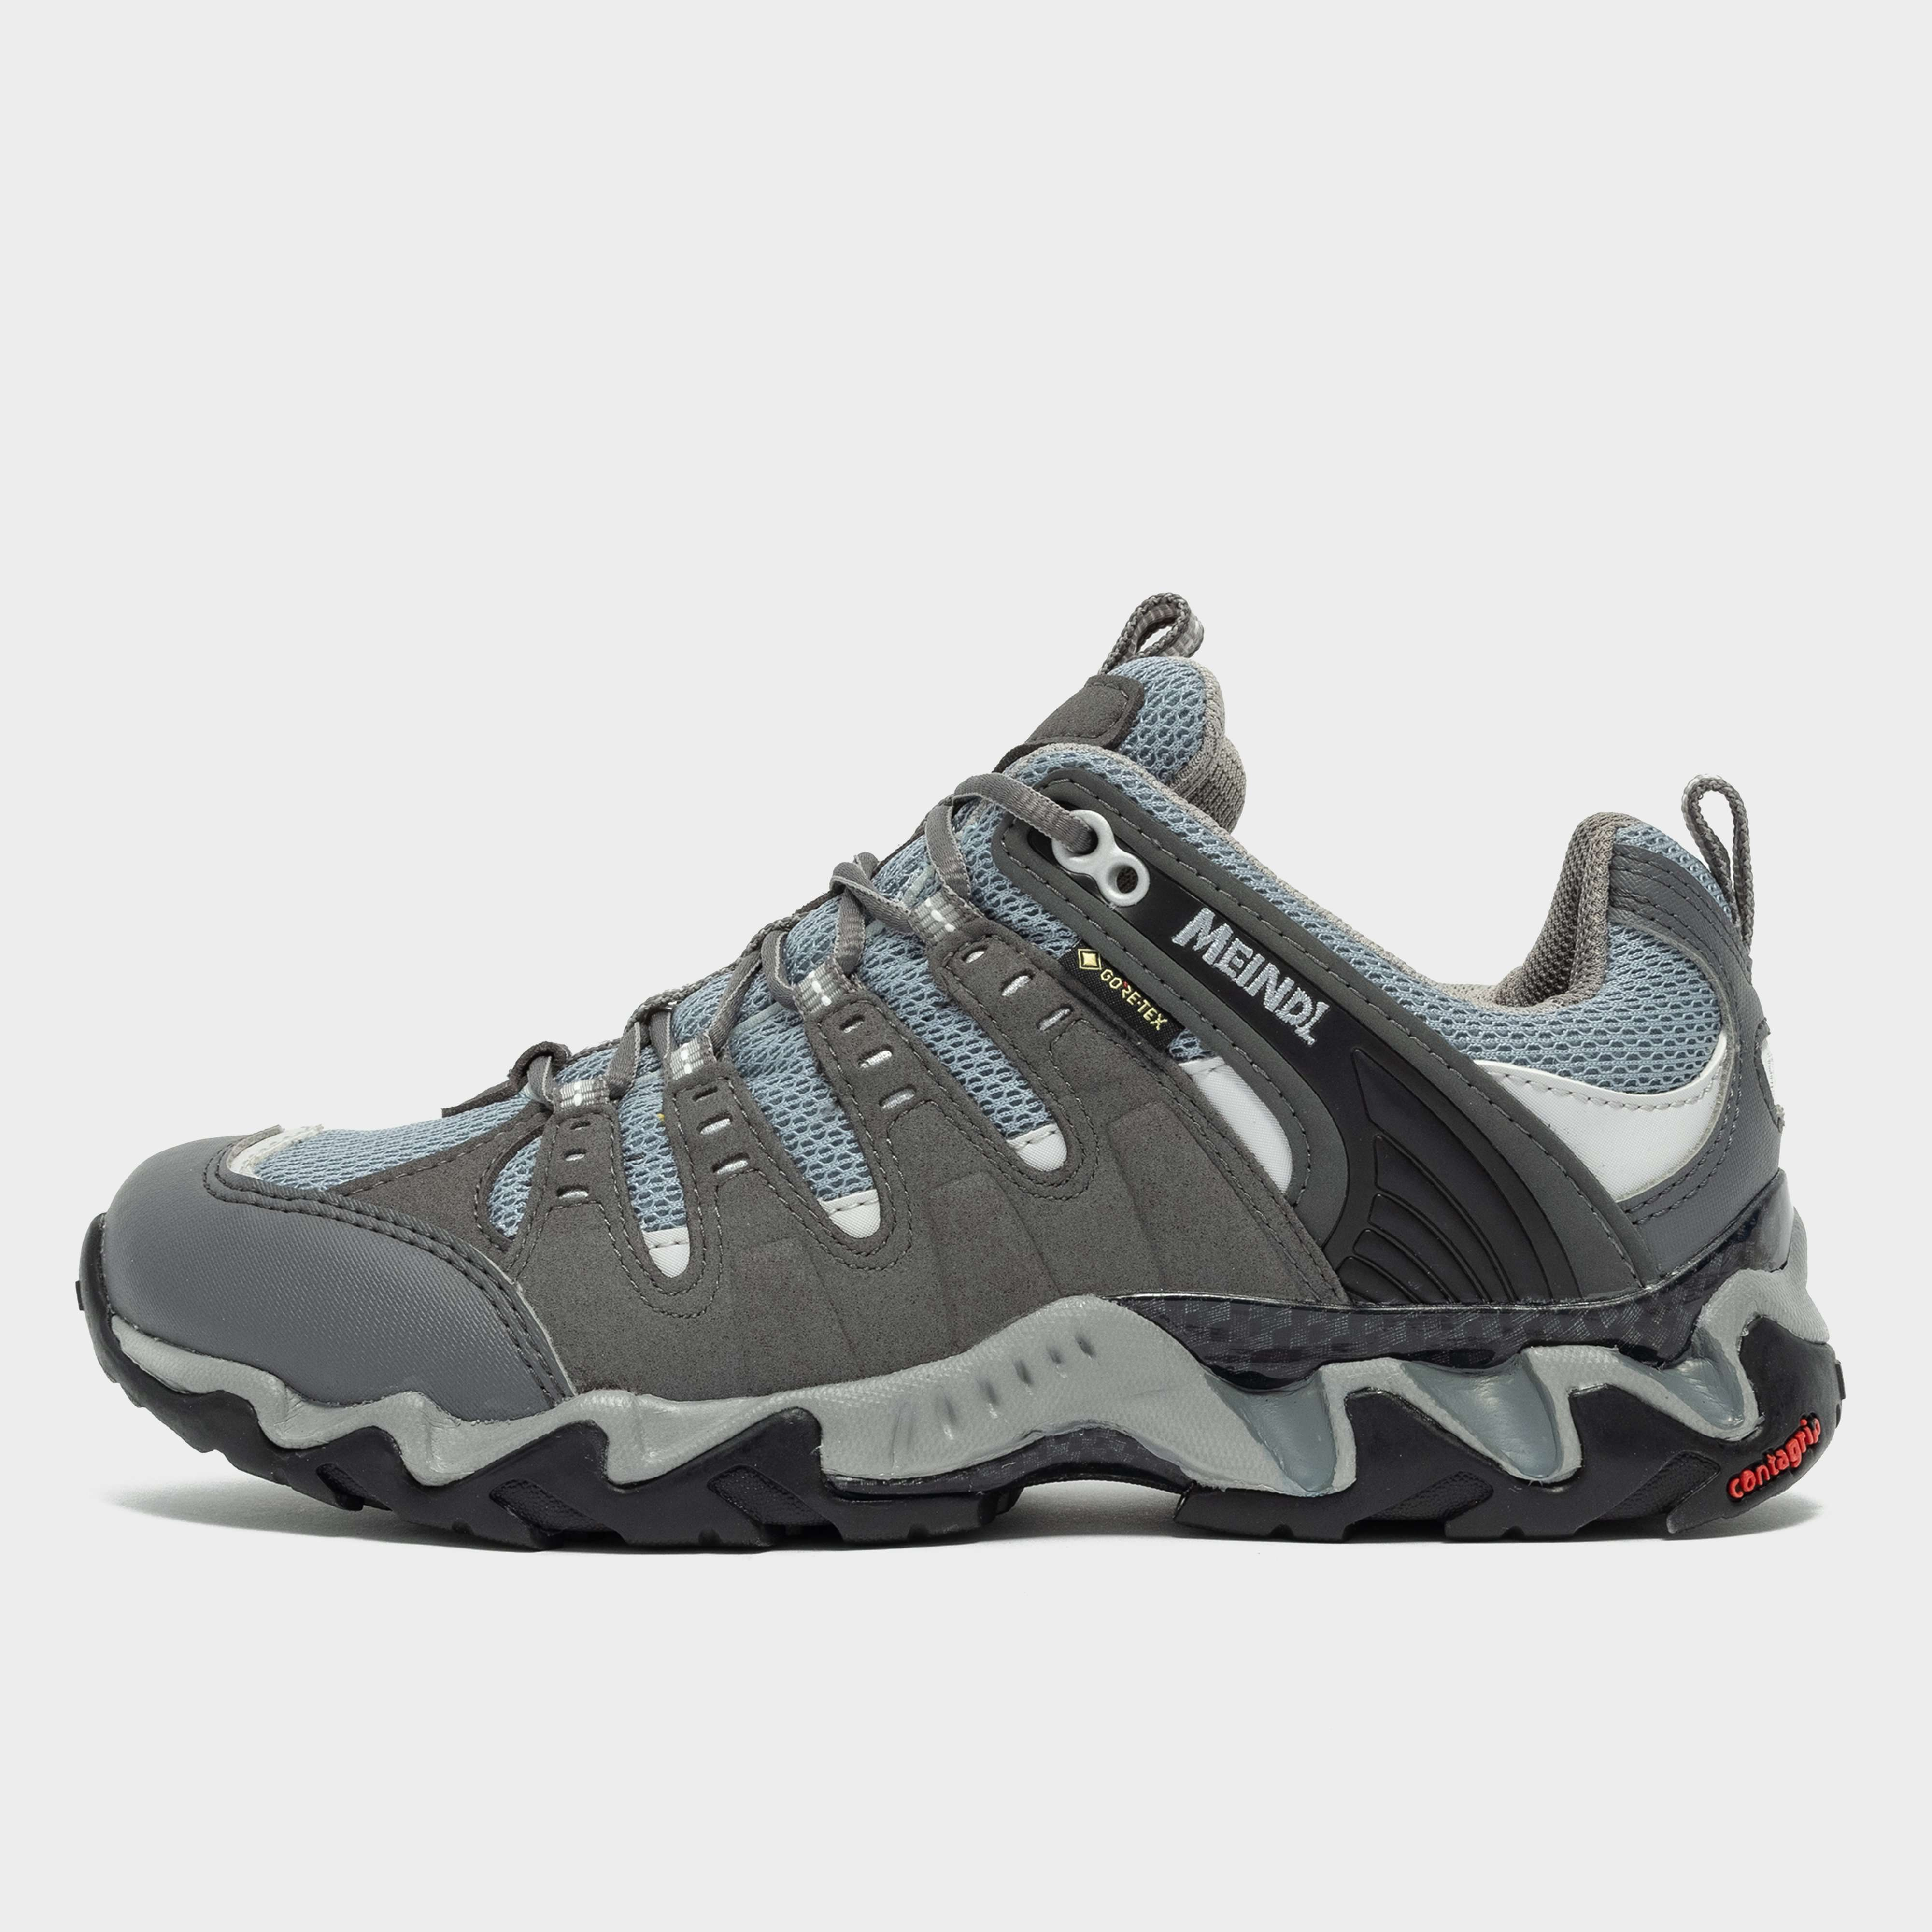 MEINDL Women's Respond GORE-TEX® Trail Shoe